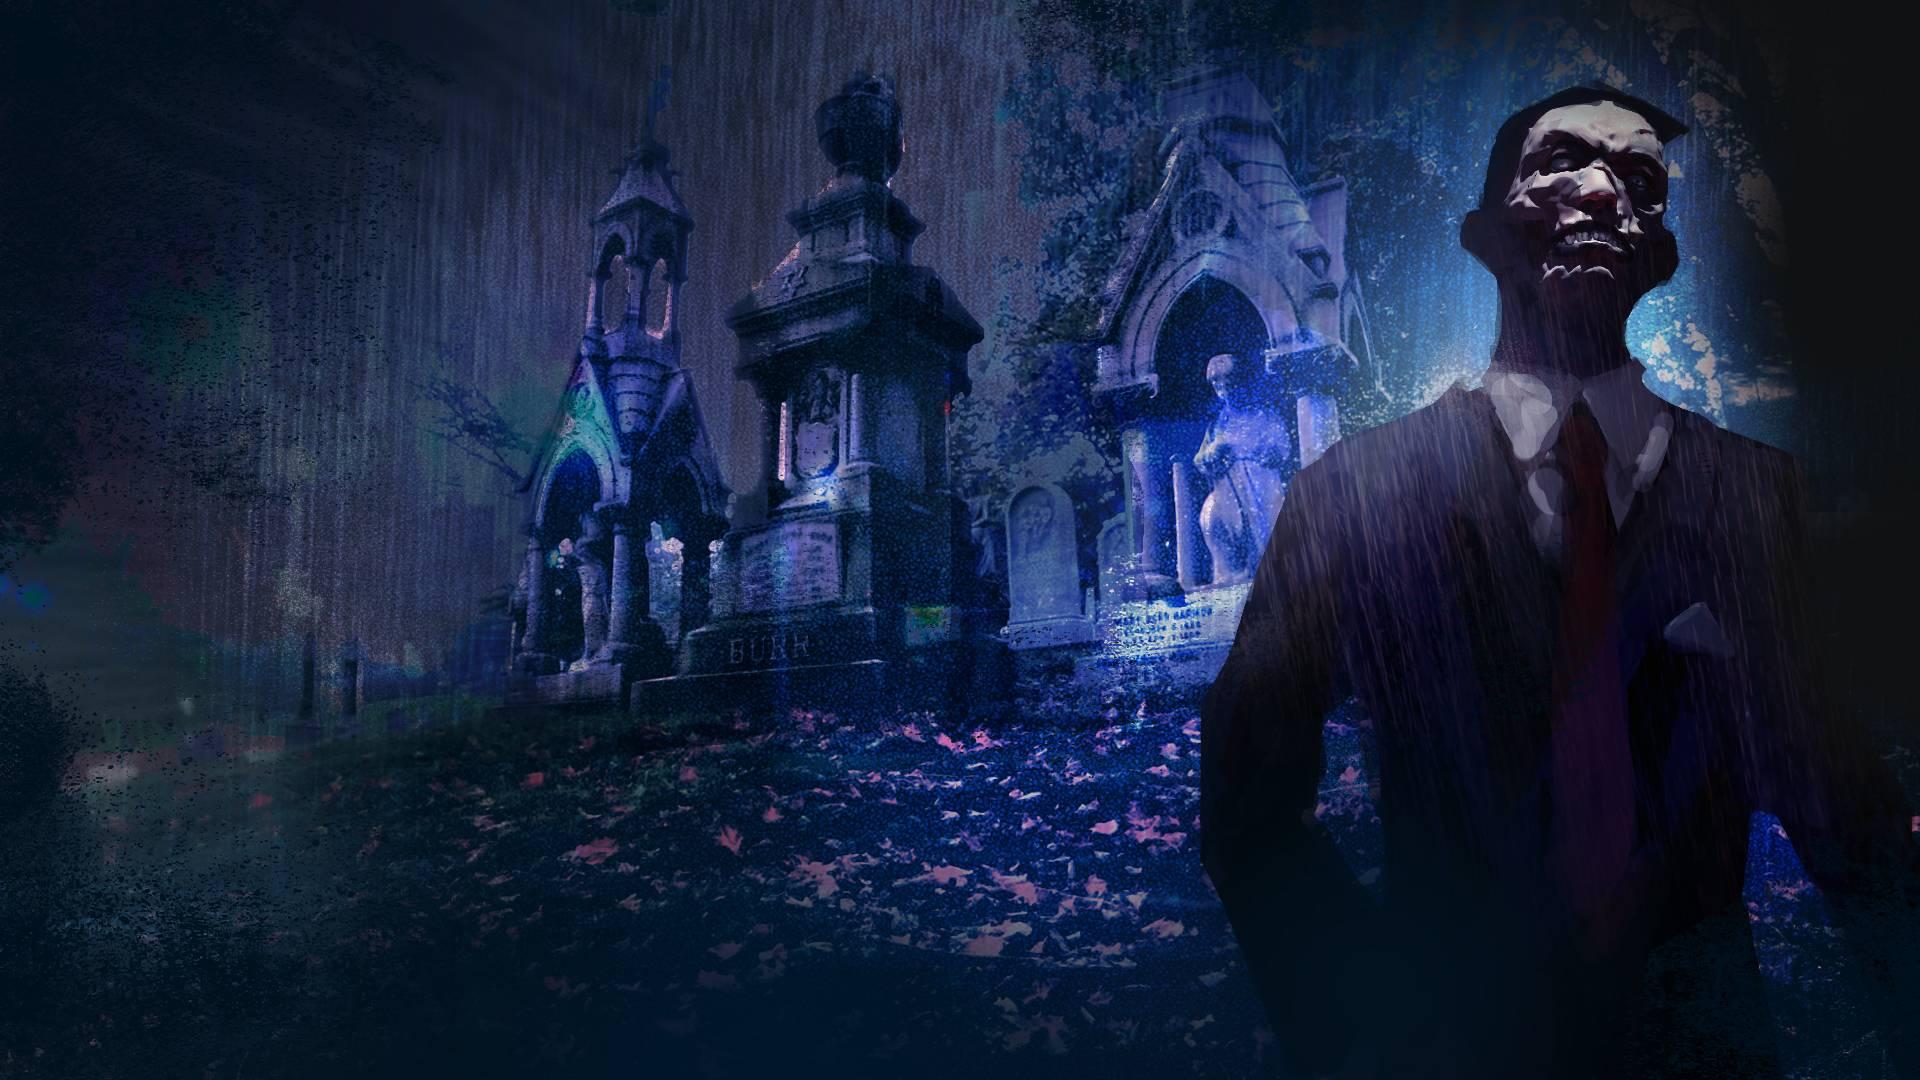 Студия Draw Distance анонсировала ещё одну игру по Vampire: The Masquerade